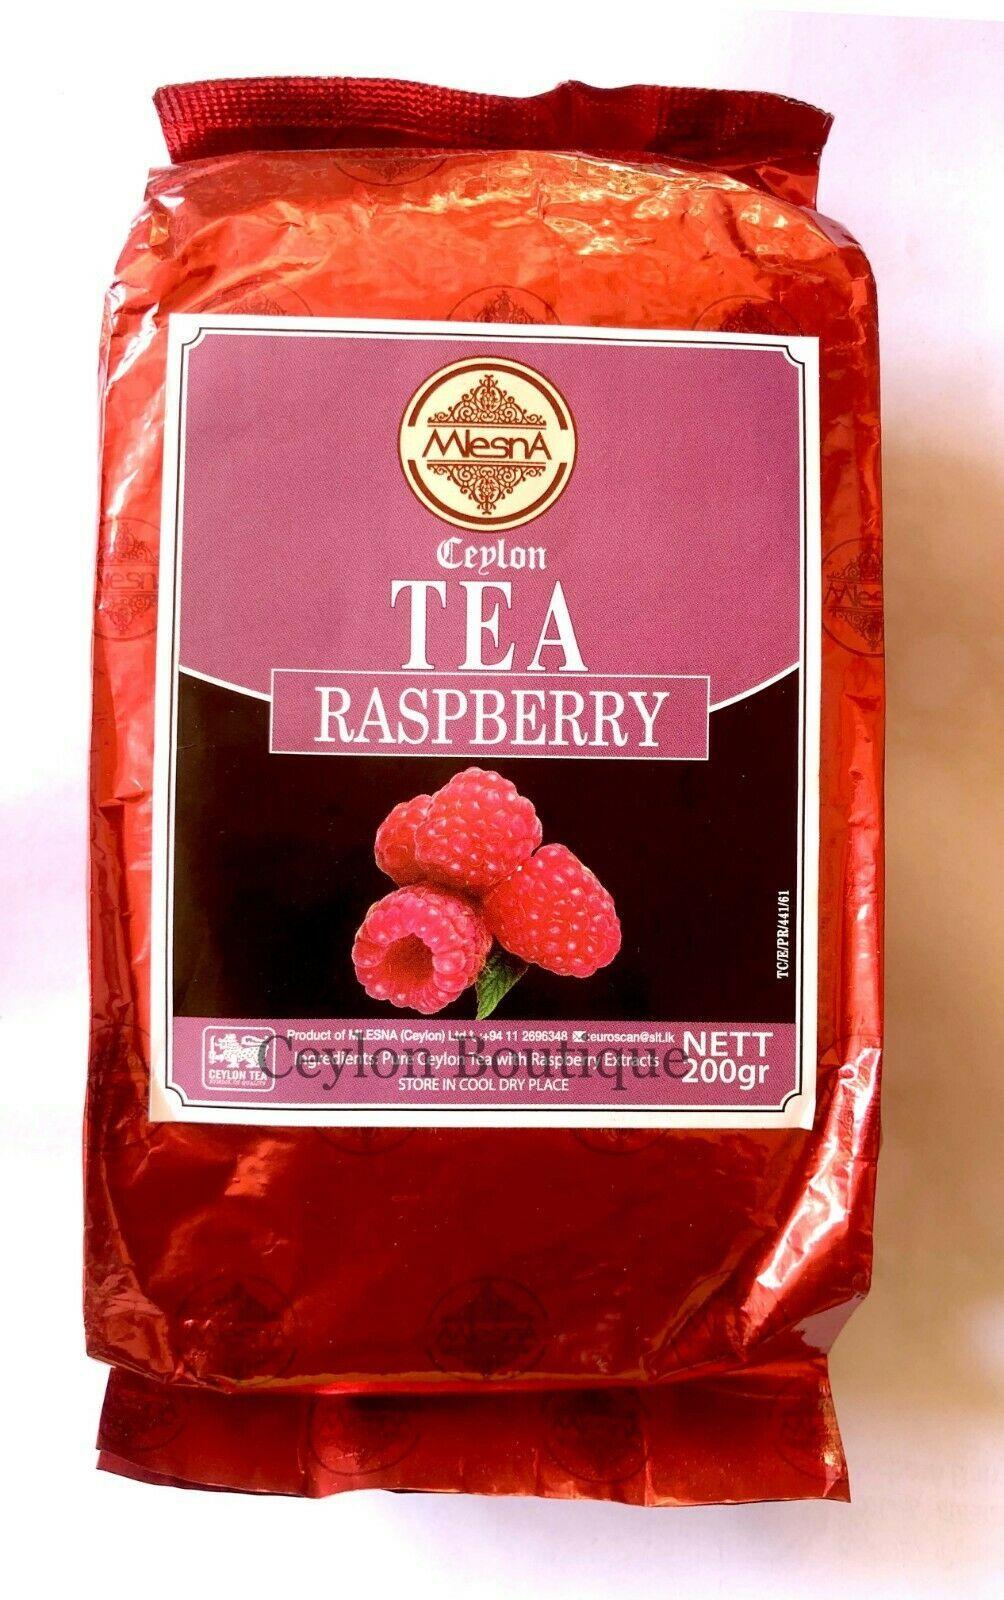 Mlesna Flavored Raspberry 200g Loose Black Tea - $14.36